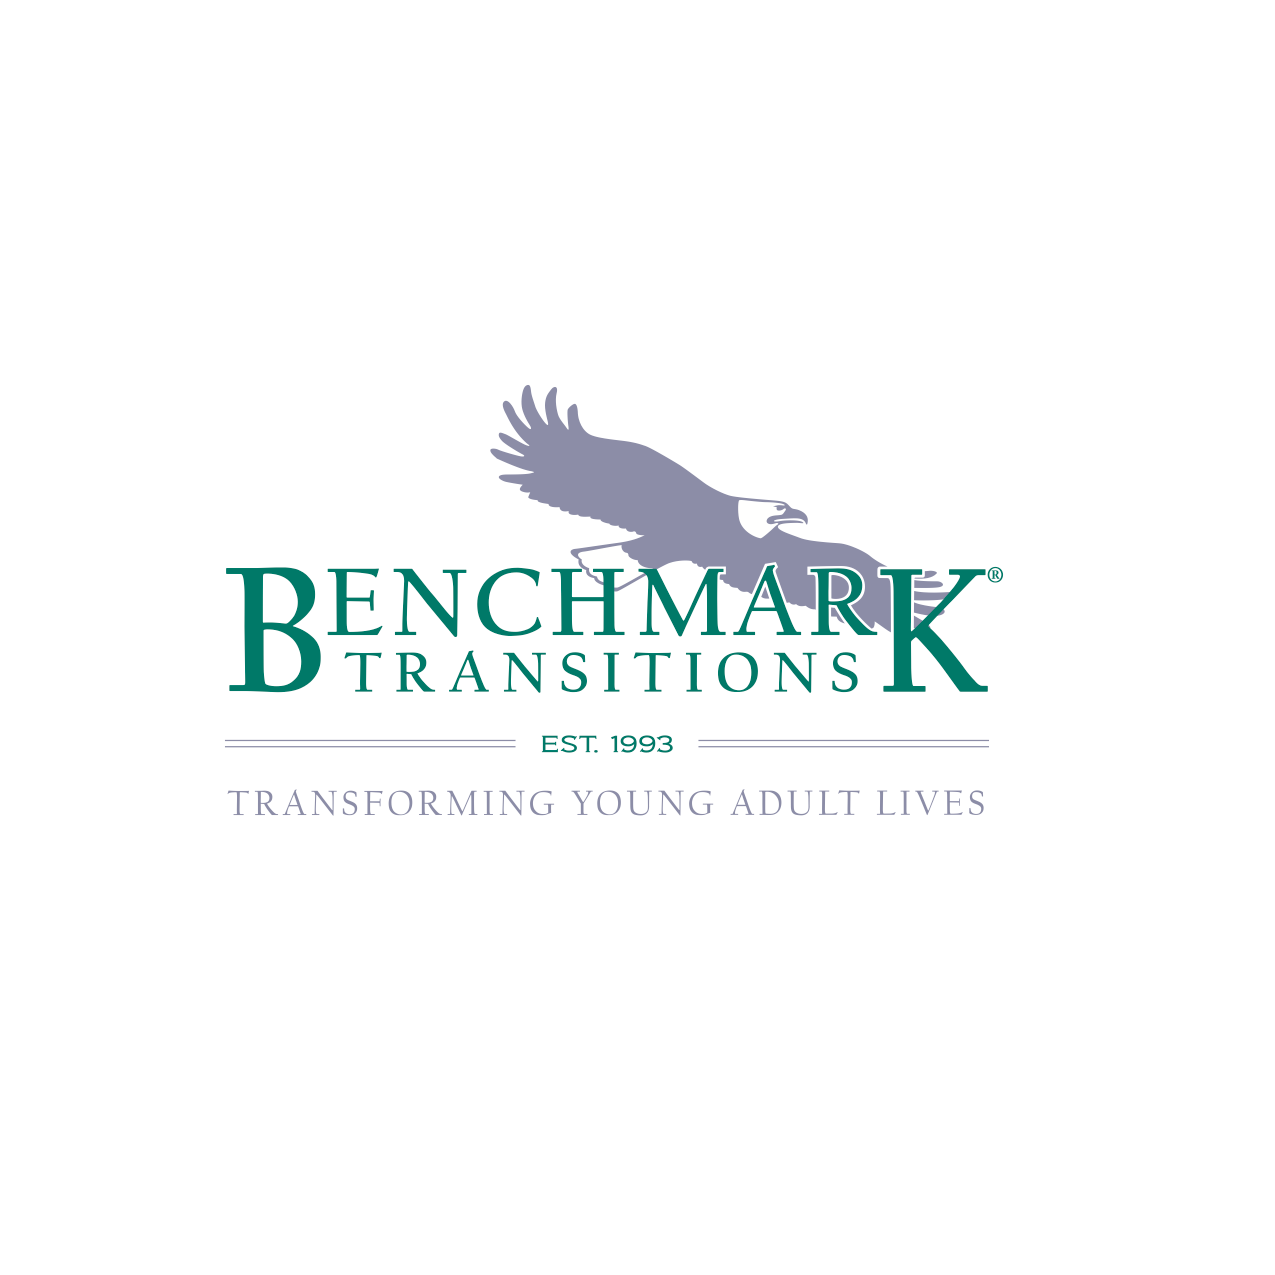 Benchmark Transitions - Redlands, CA - Mental Health Services